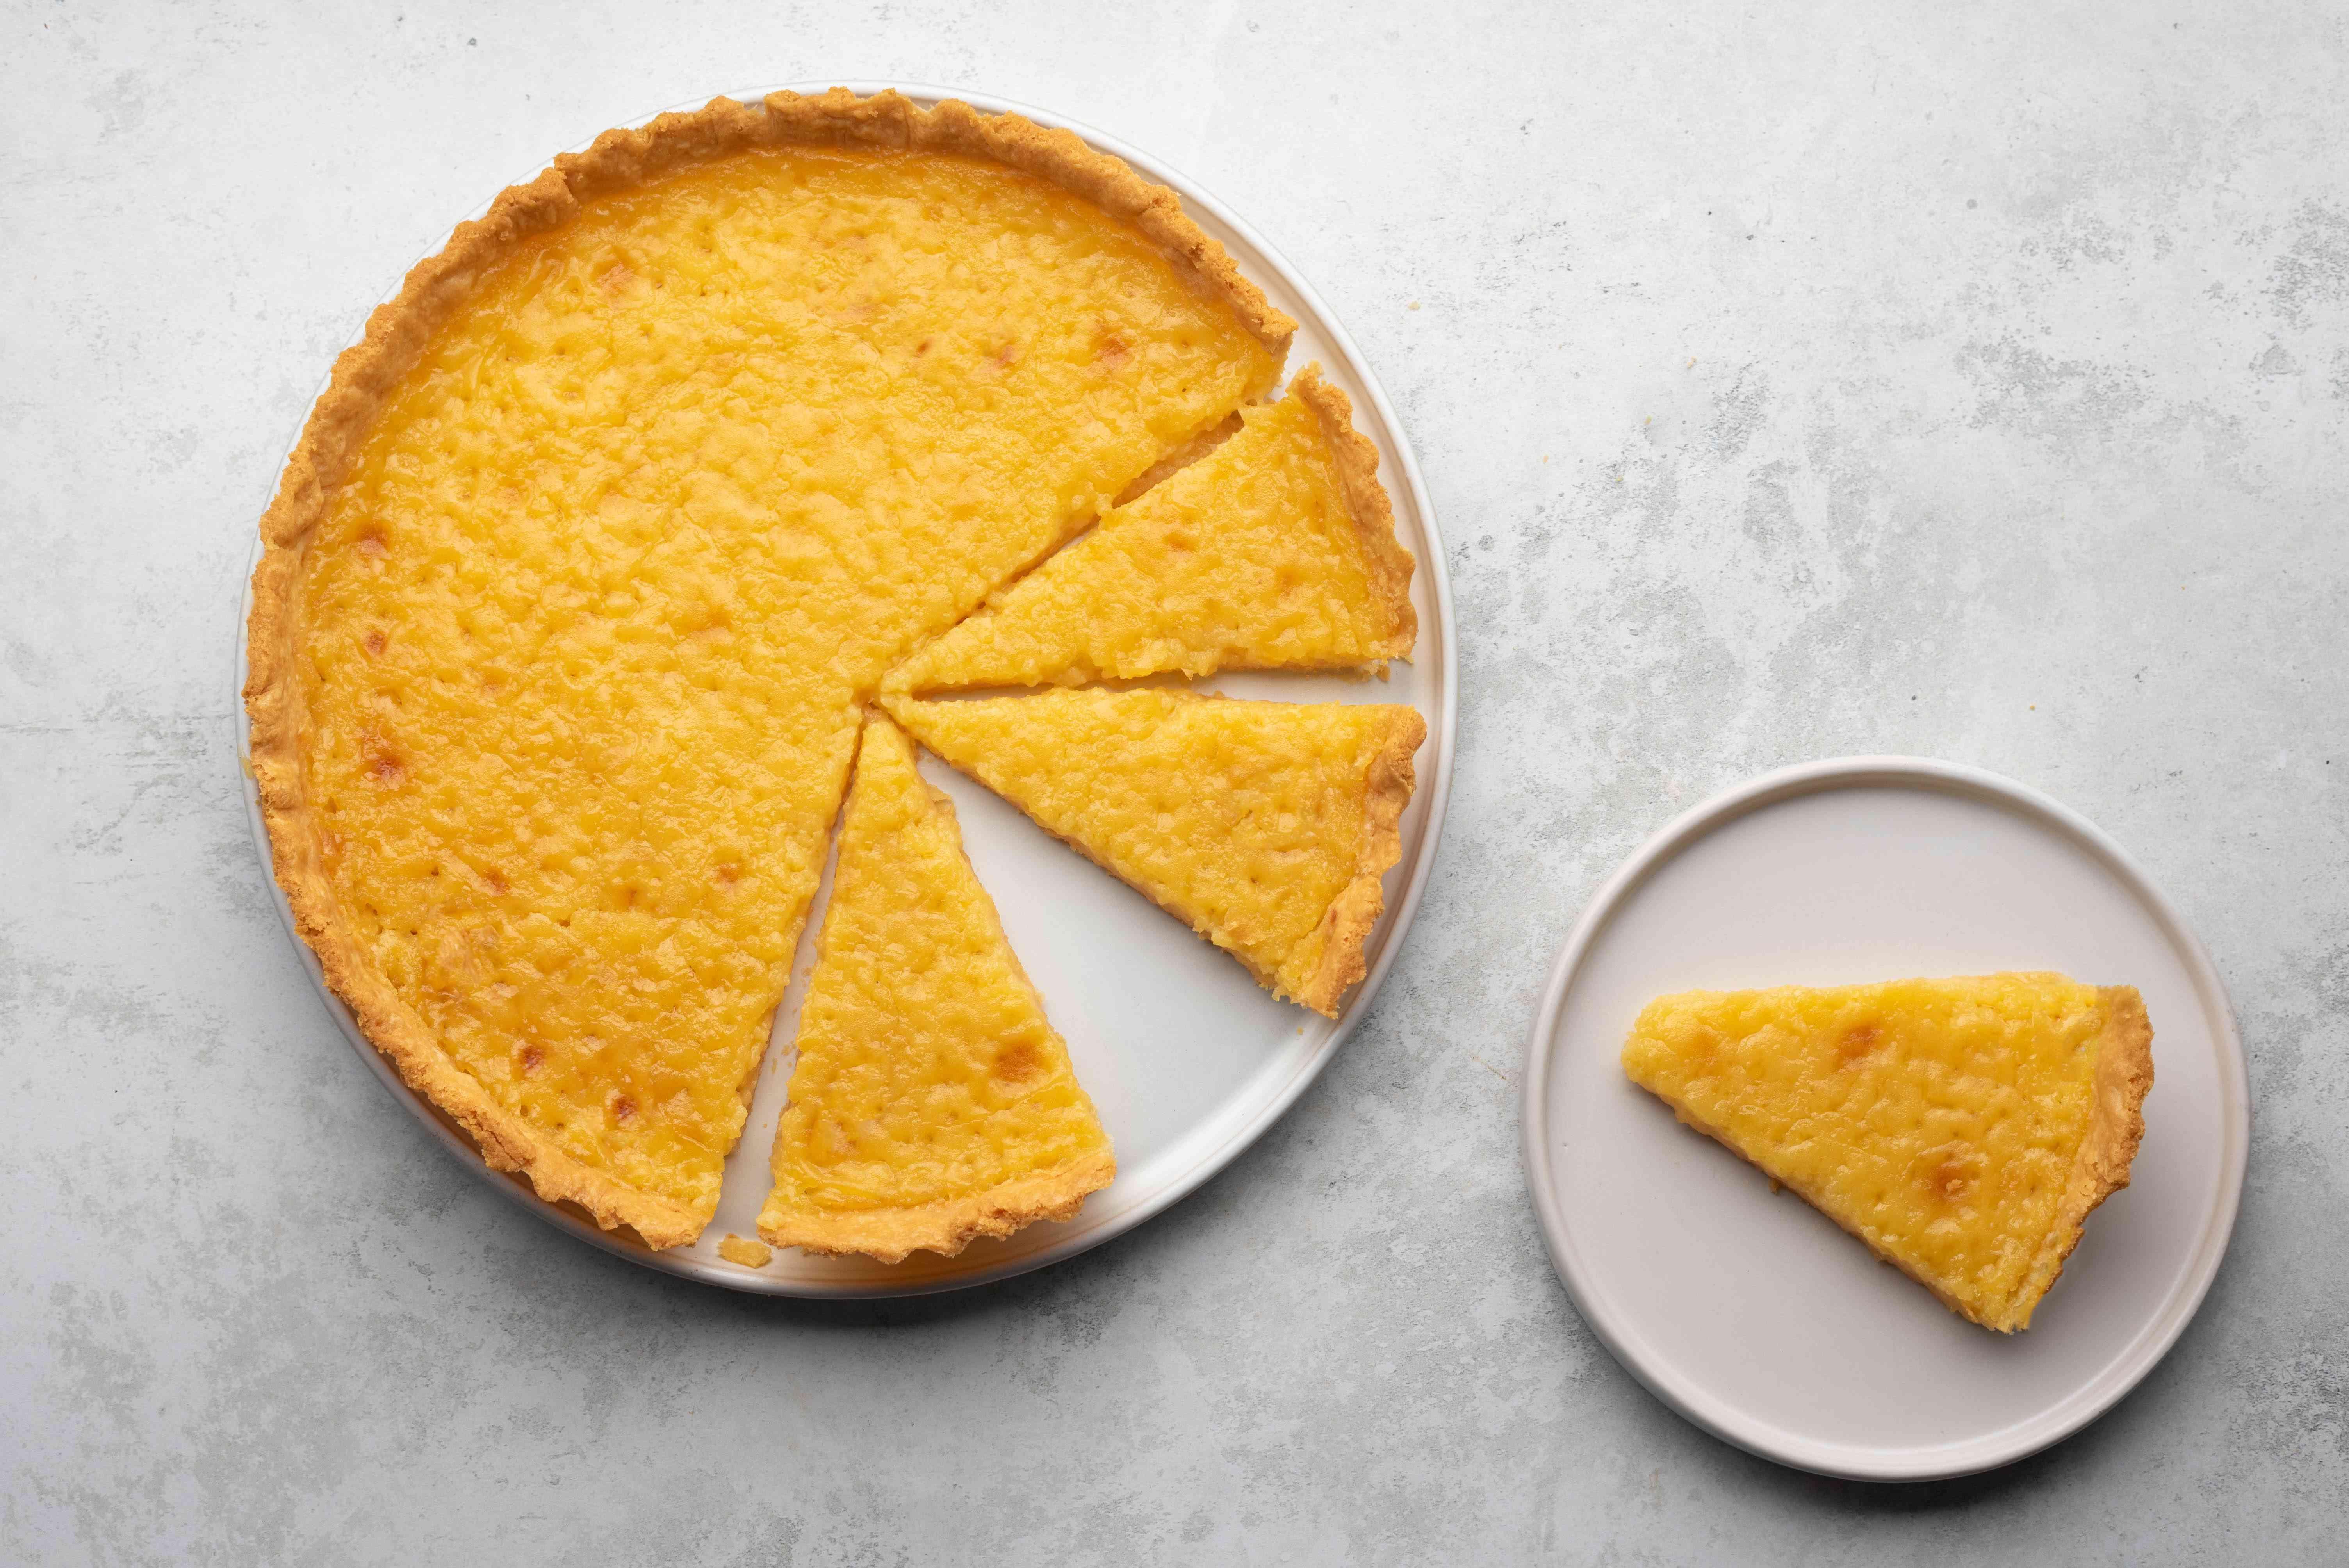 Classic French Lemon Tart, slice on a plate